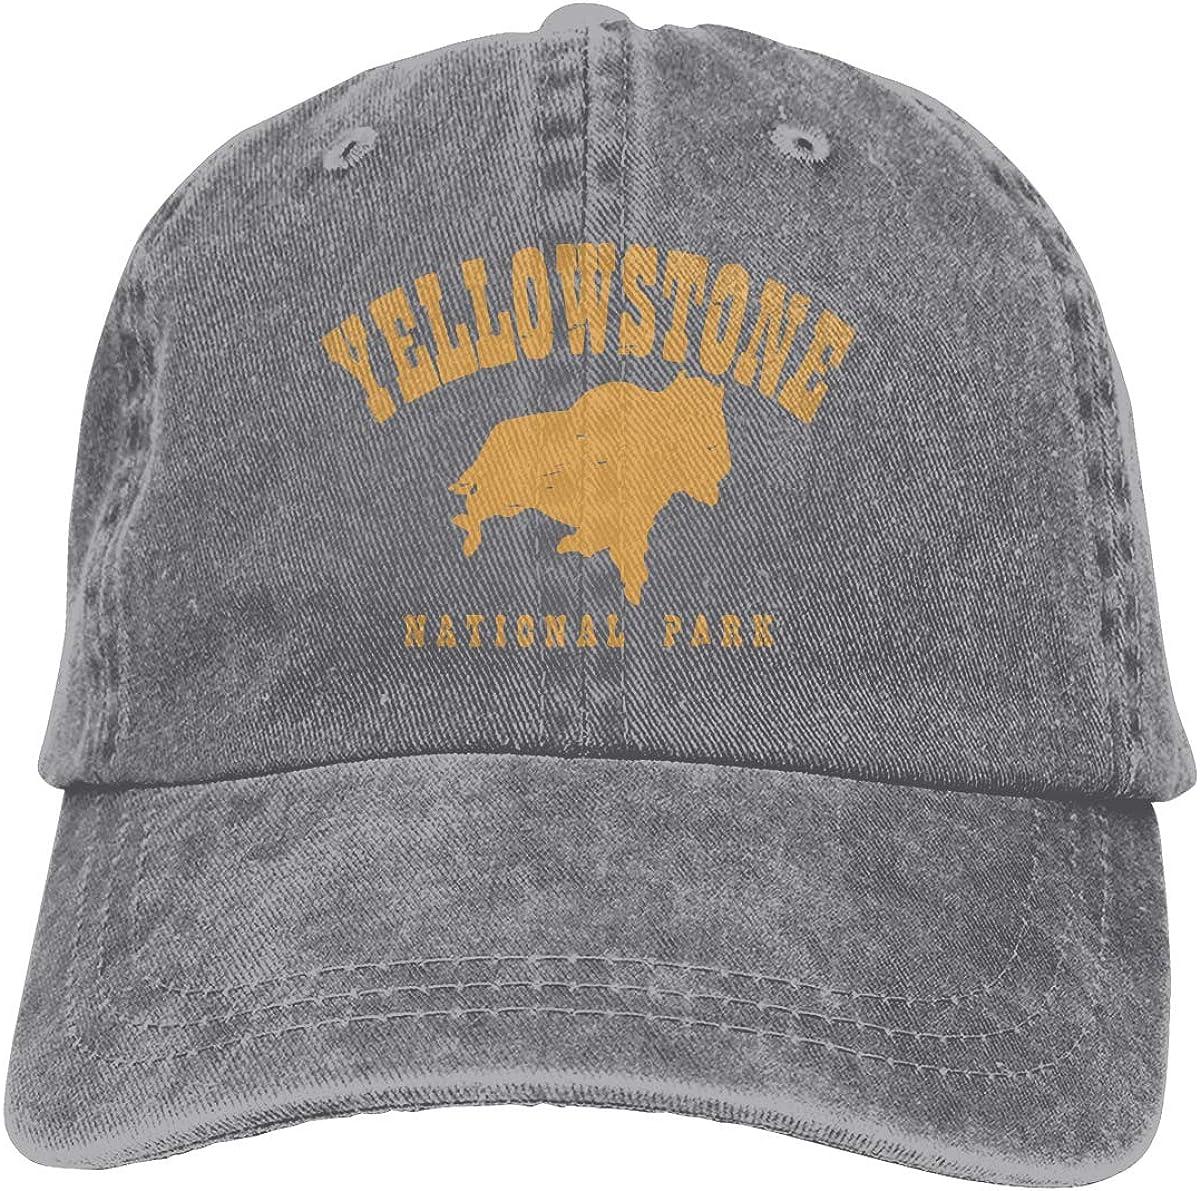 Yosemite National Park Baseball Hats Mans Women Adjustable Mesh Trucker Flat Caps